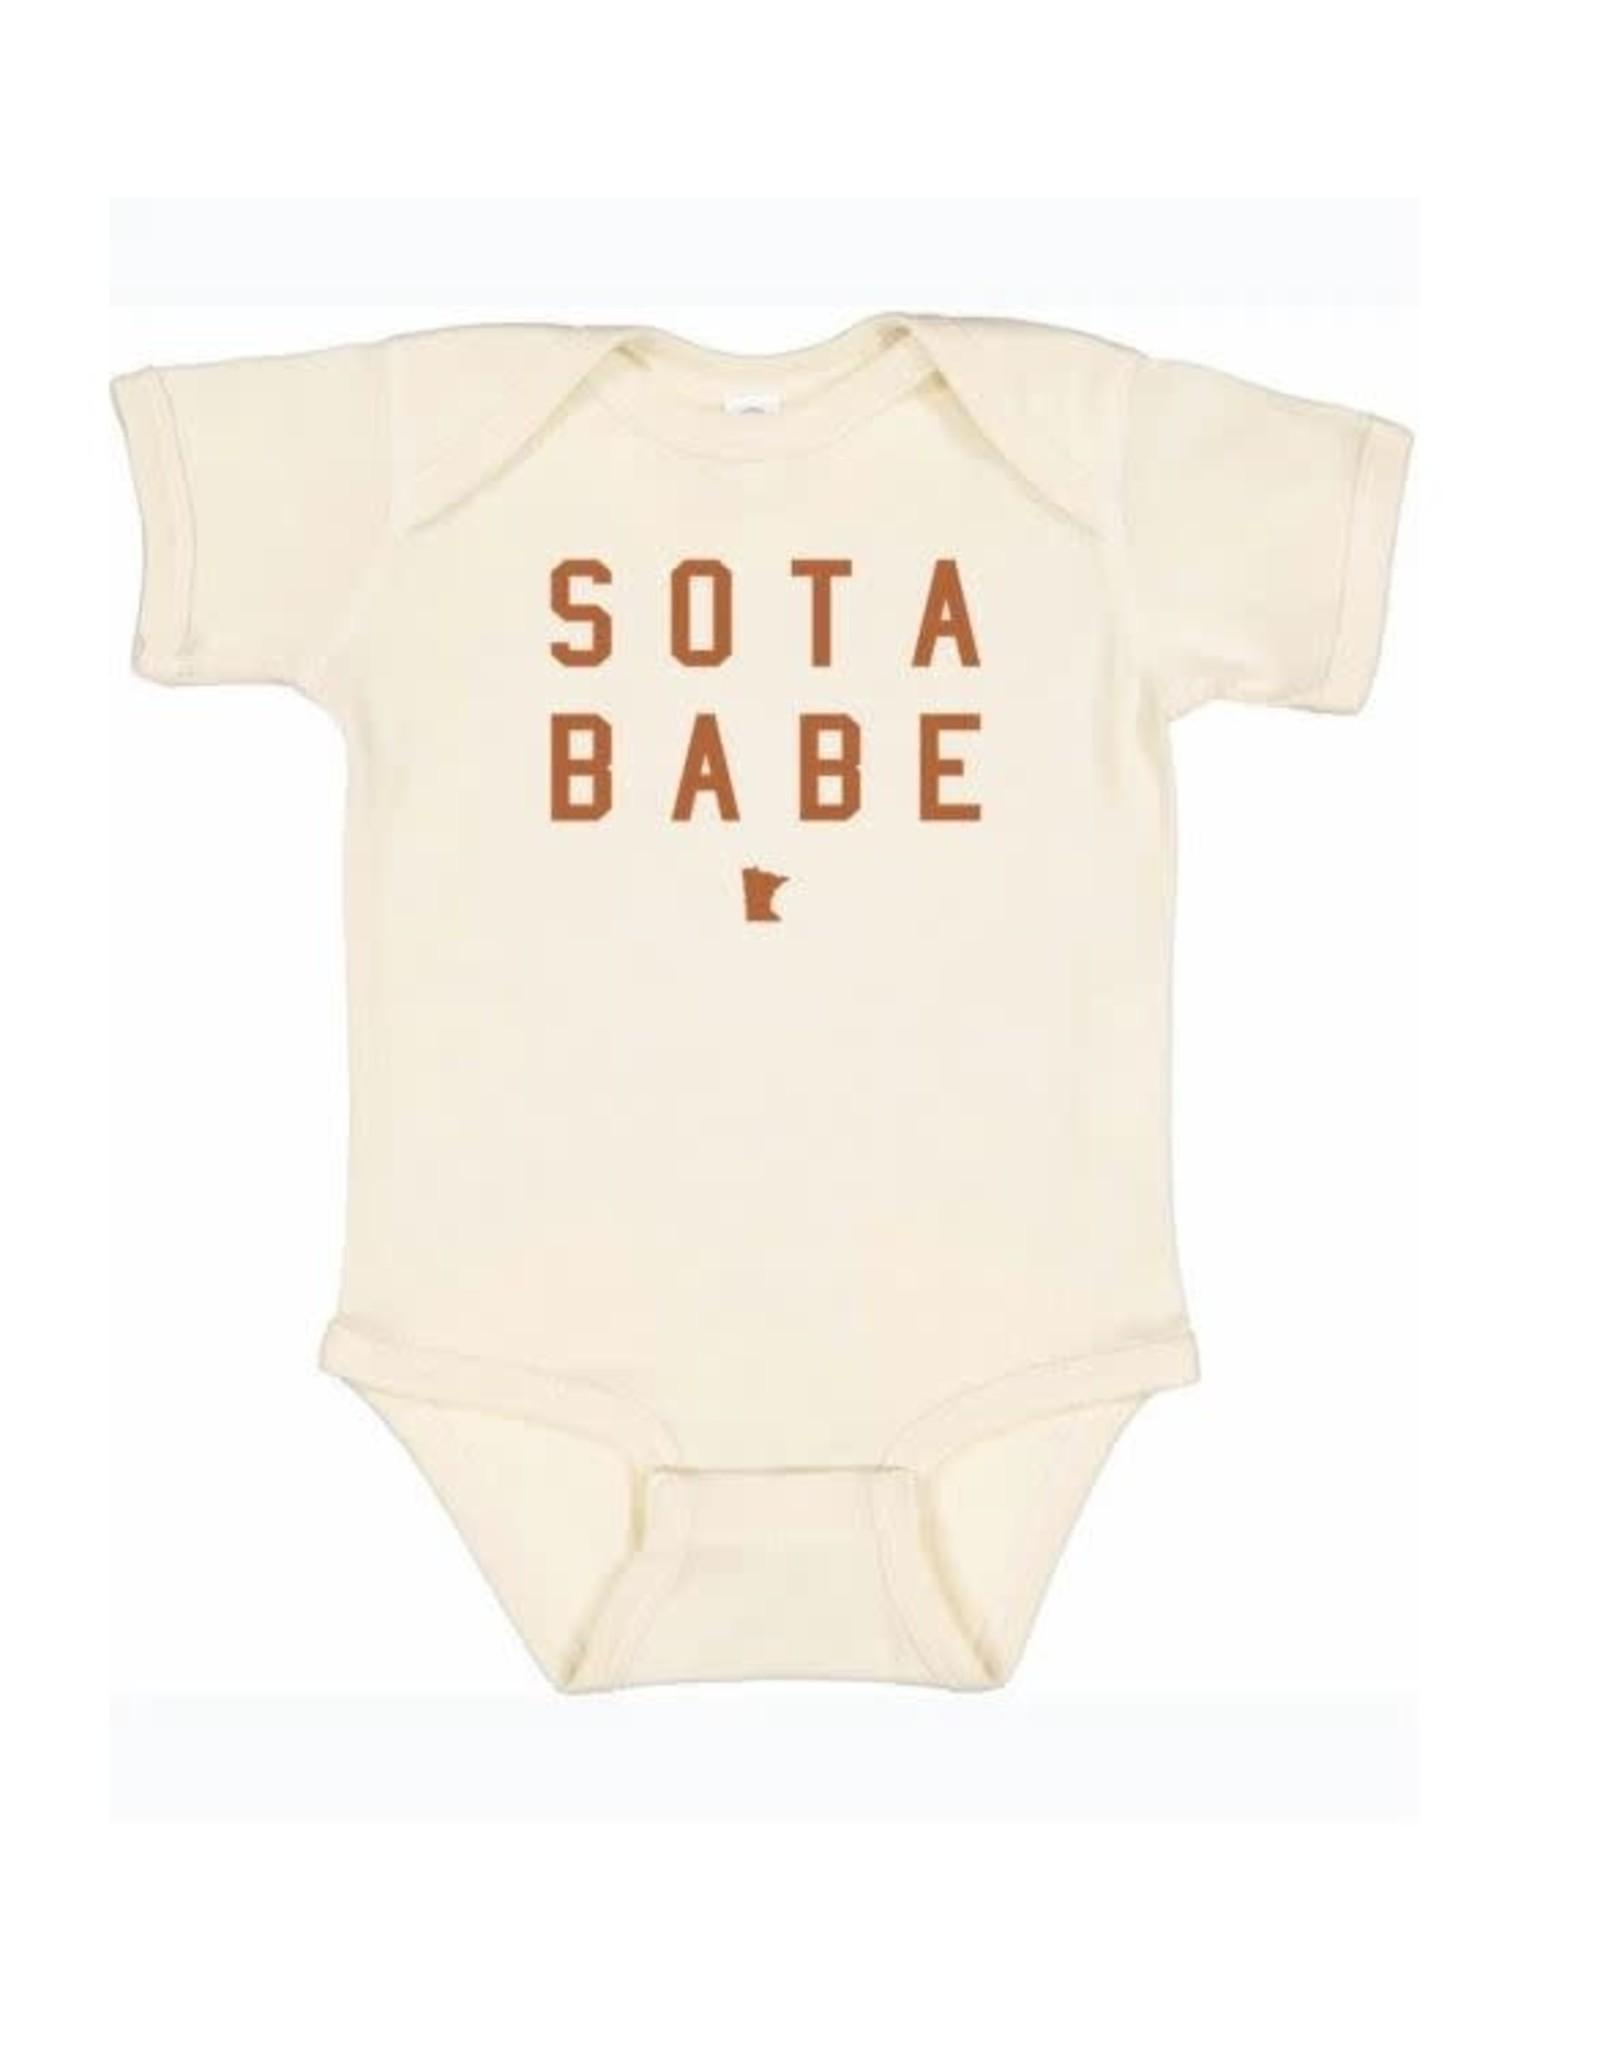 MINNESOTA SOTA BABE ONESIE